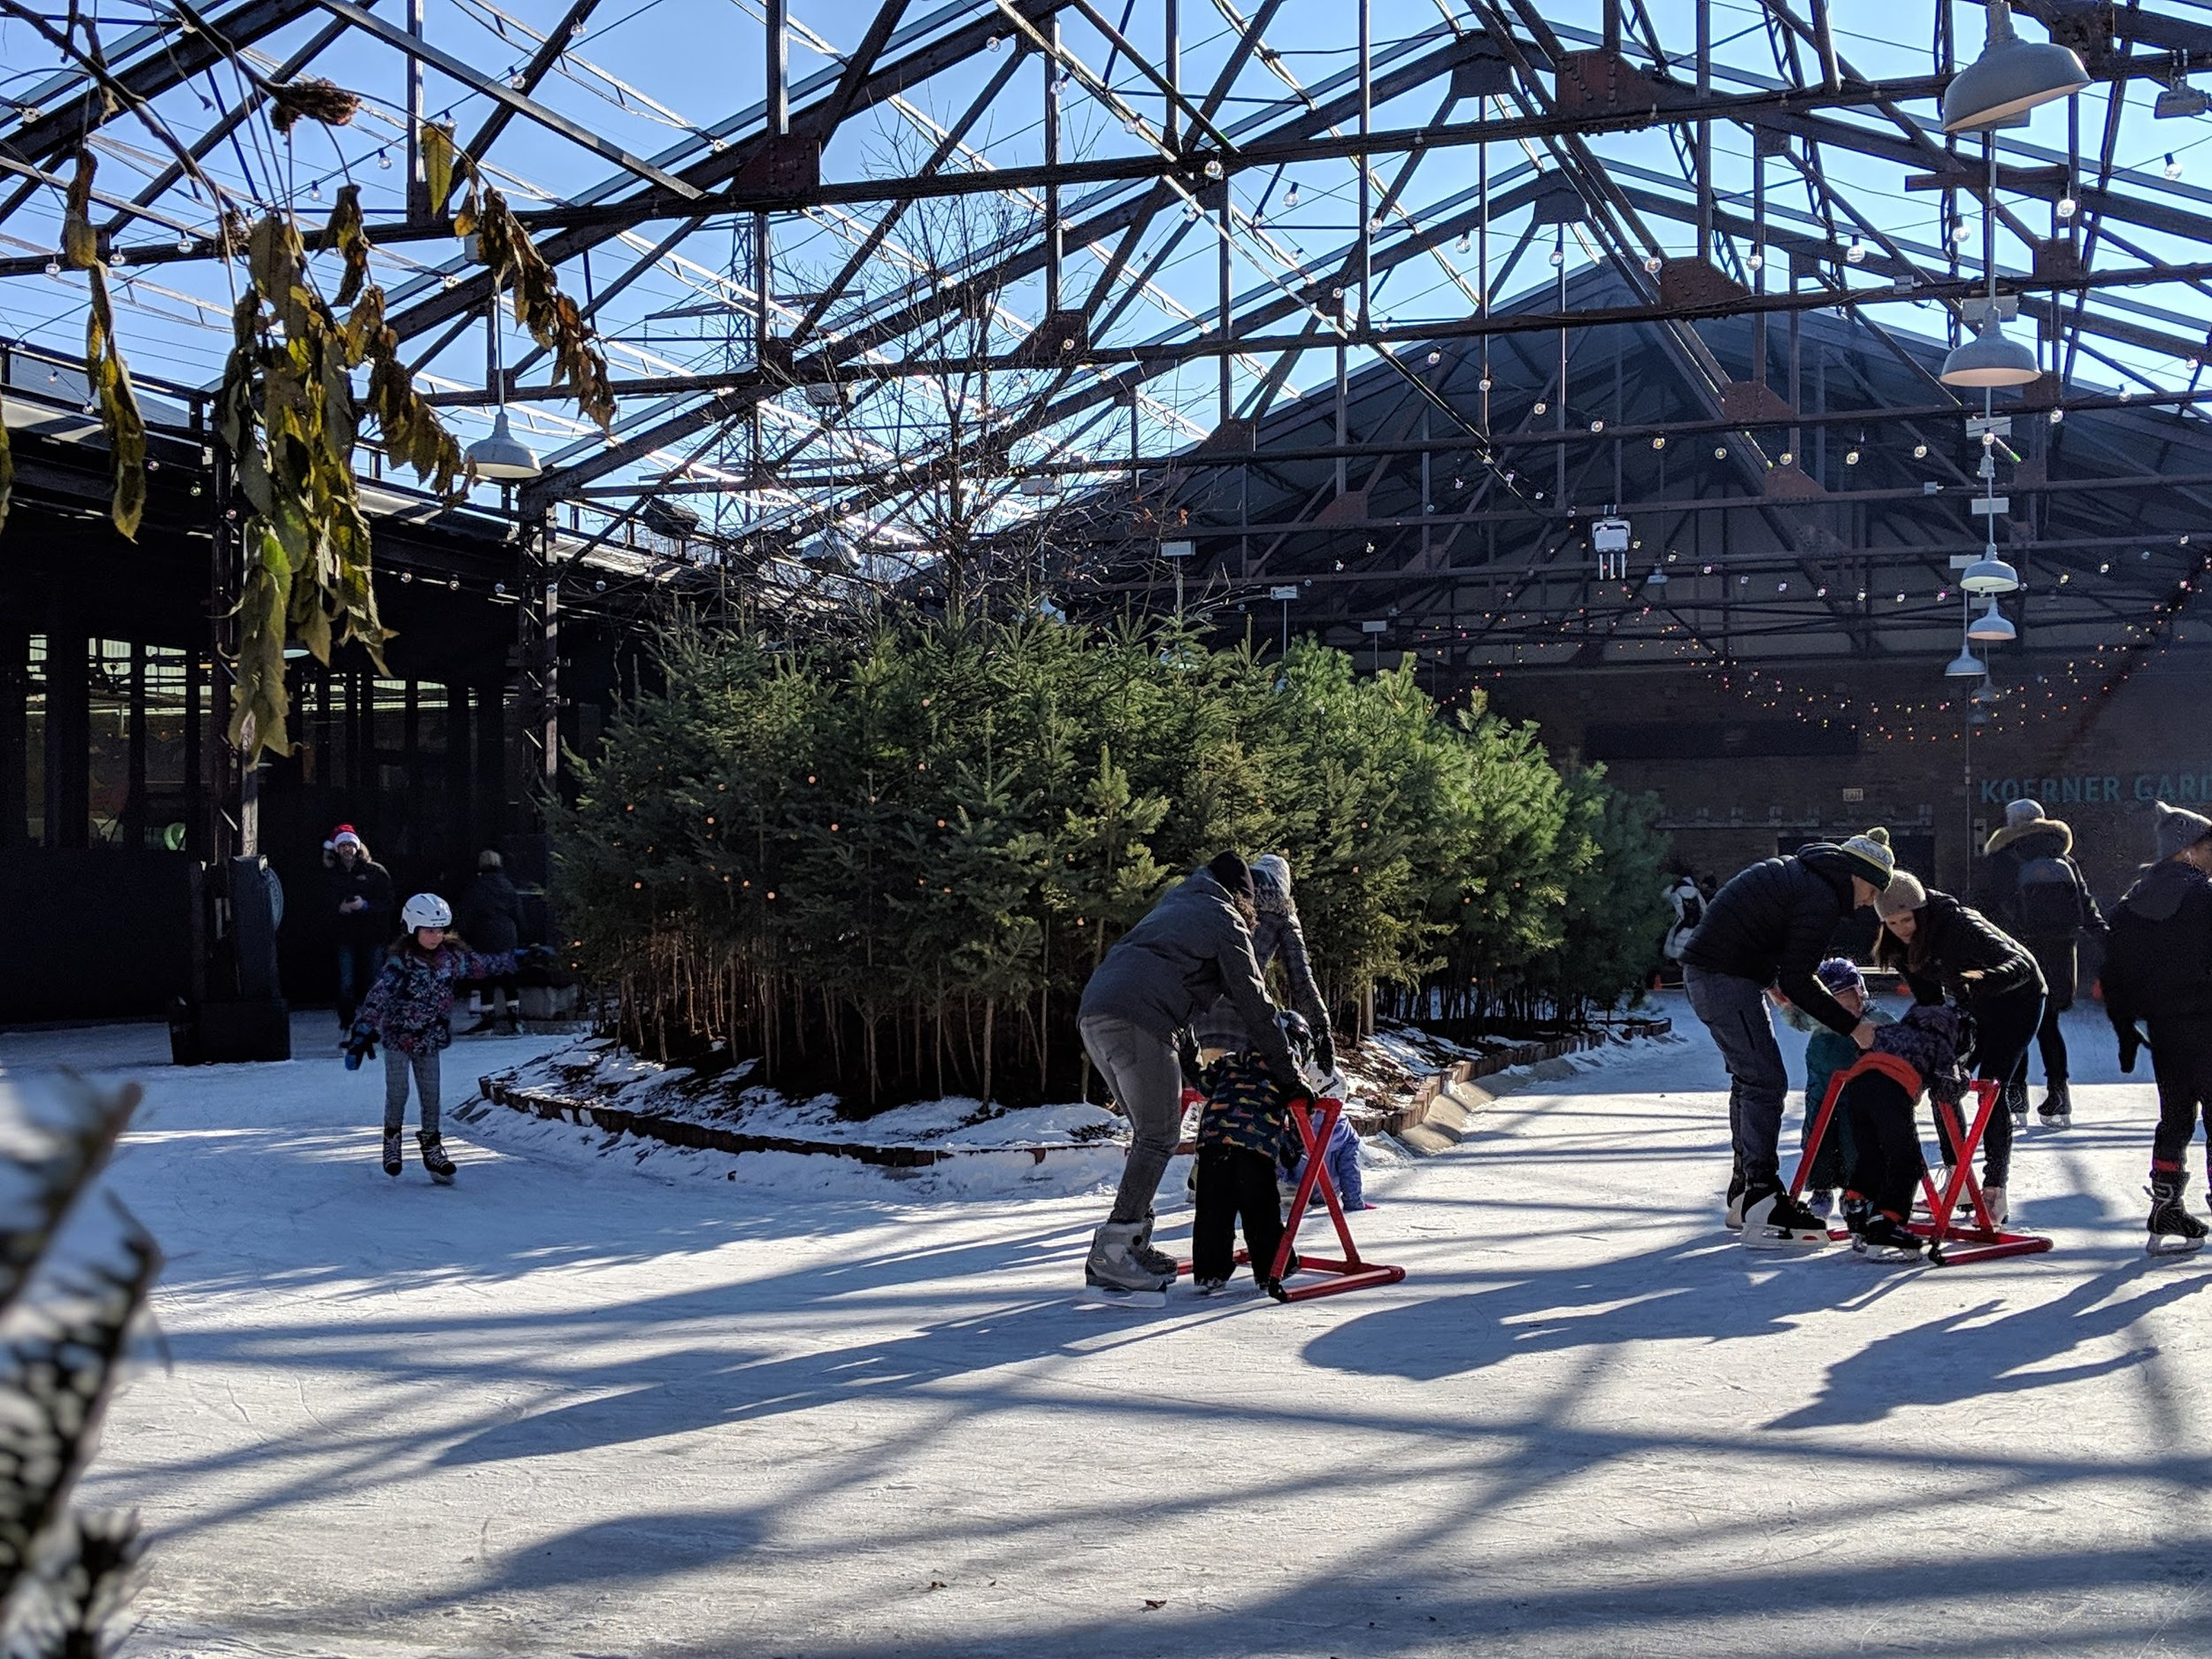 Children-family-winter-activity-Toronto-lifestyle-photographer.jpg